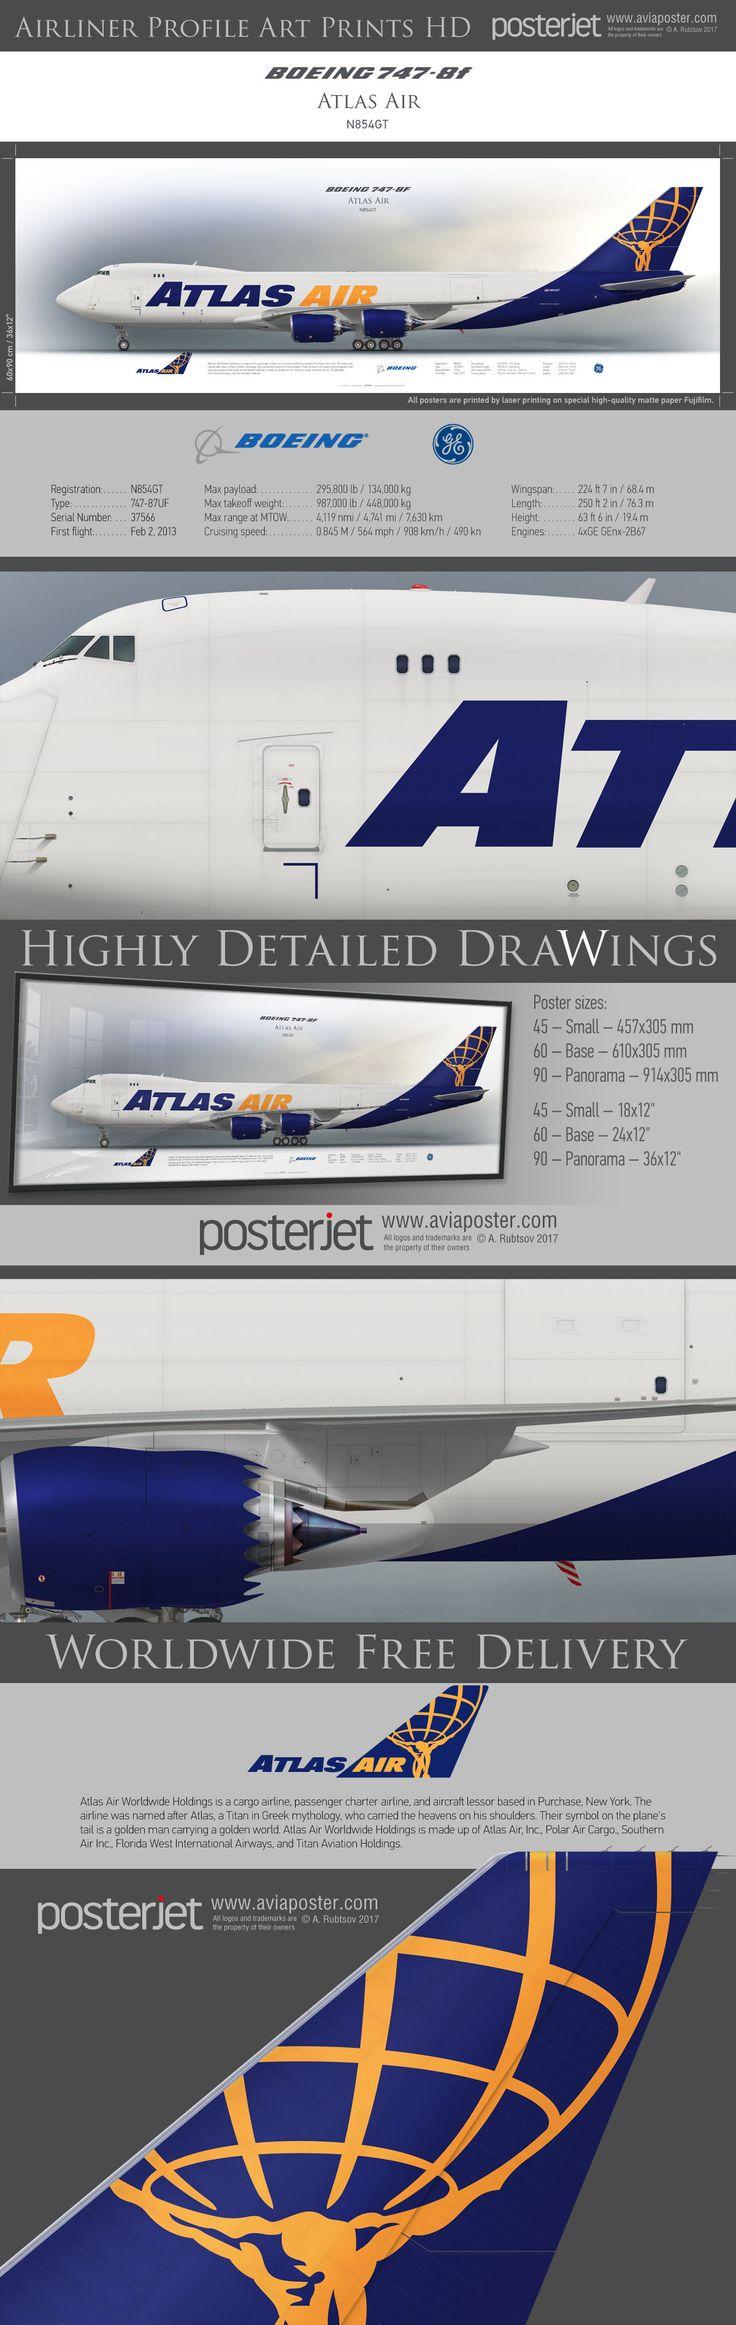 Boeing 747-8f Atlas Air N854GT | www.aviaposter.com | #airliners #aviation #jetliner #airplane #pilot #aviationlovers #avgeek #jet #sideplane #airport #jumbojet